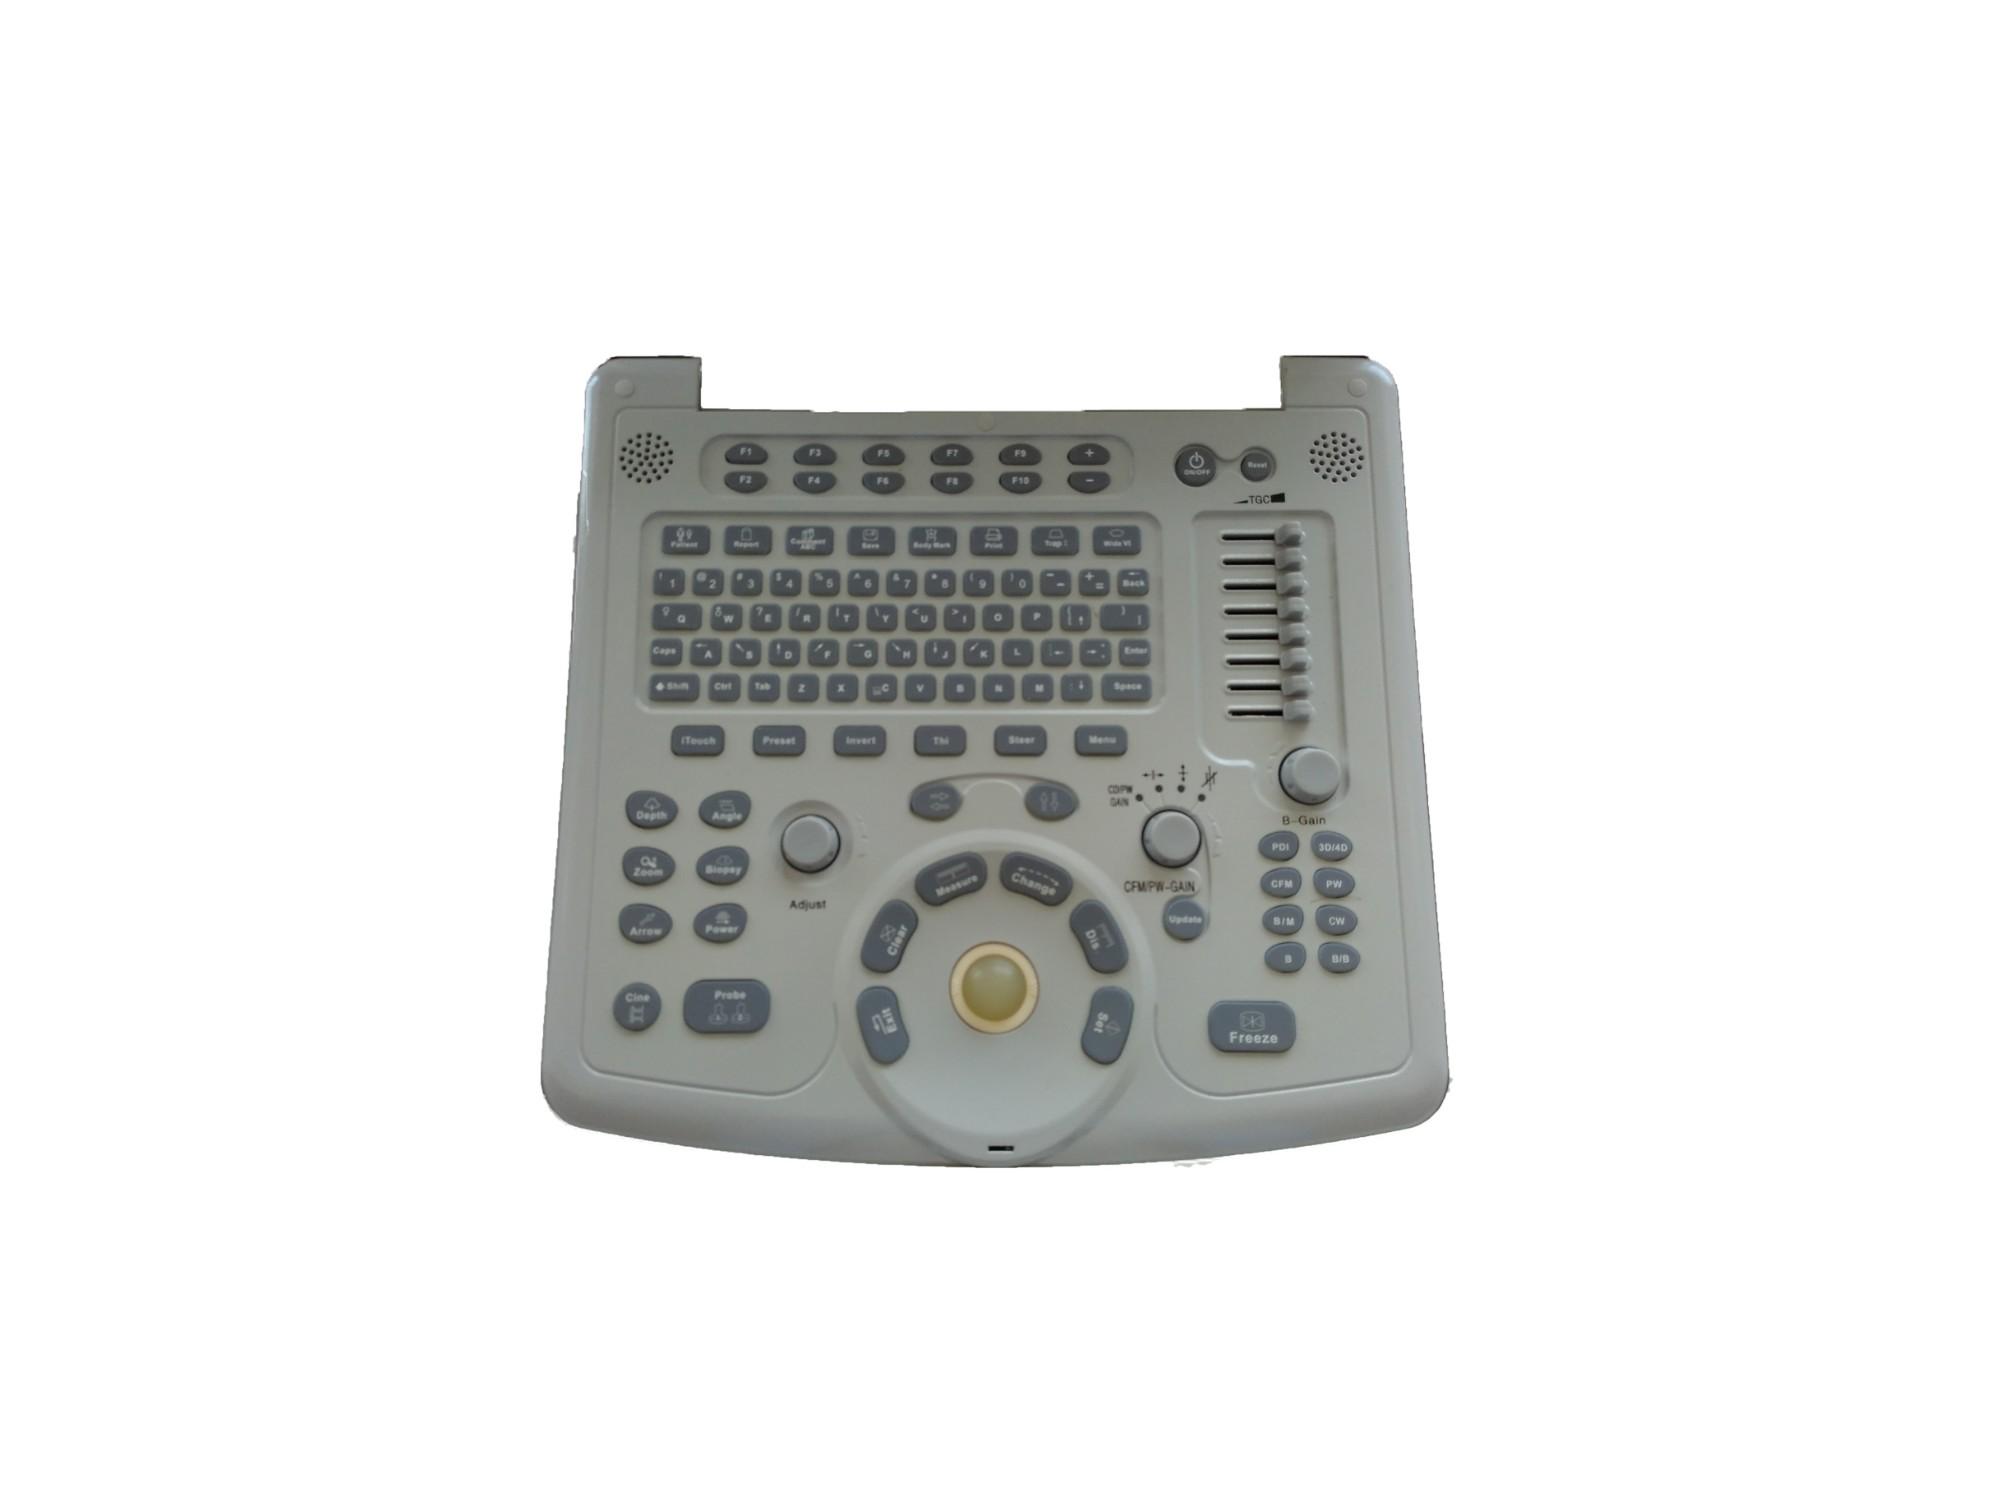 3d Portable Color Doppler Ultrasound Manufacturers, 3d Portable Color Doppler Ultrasound Factory, Supply 3d Portable Color Doppler Ultrasound